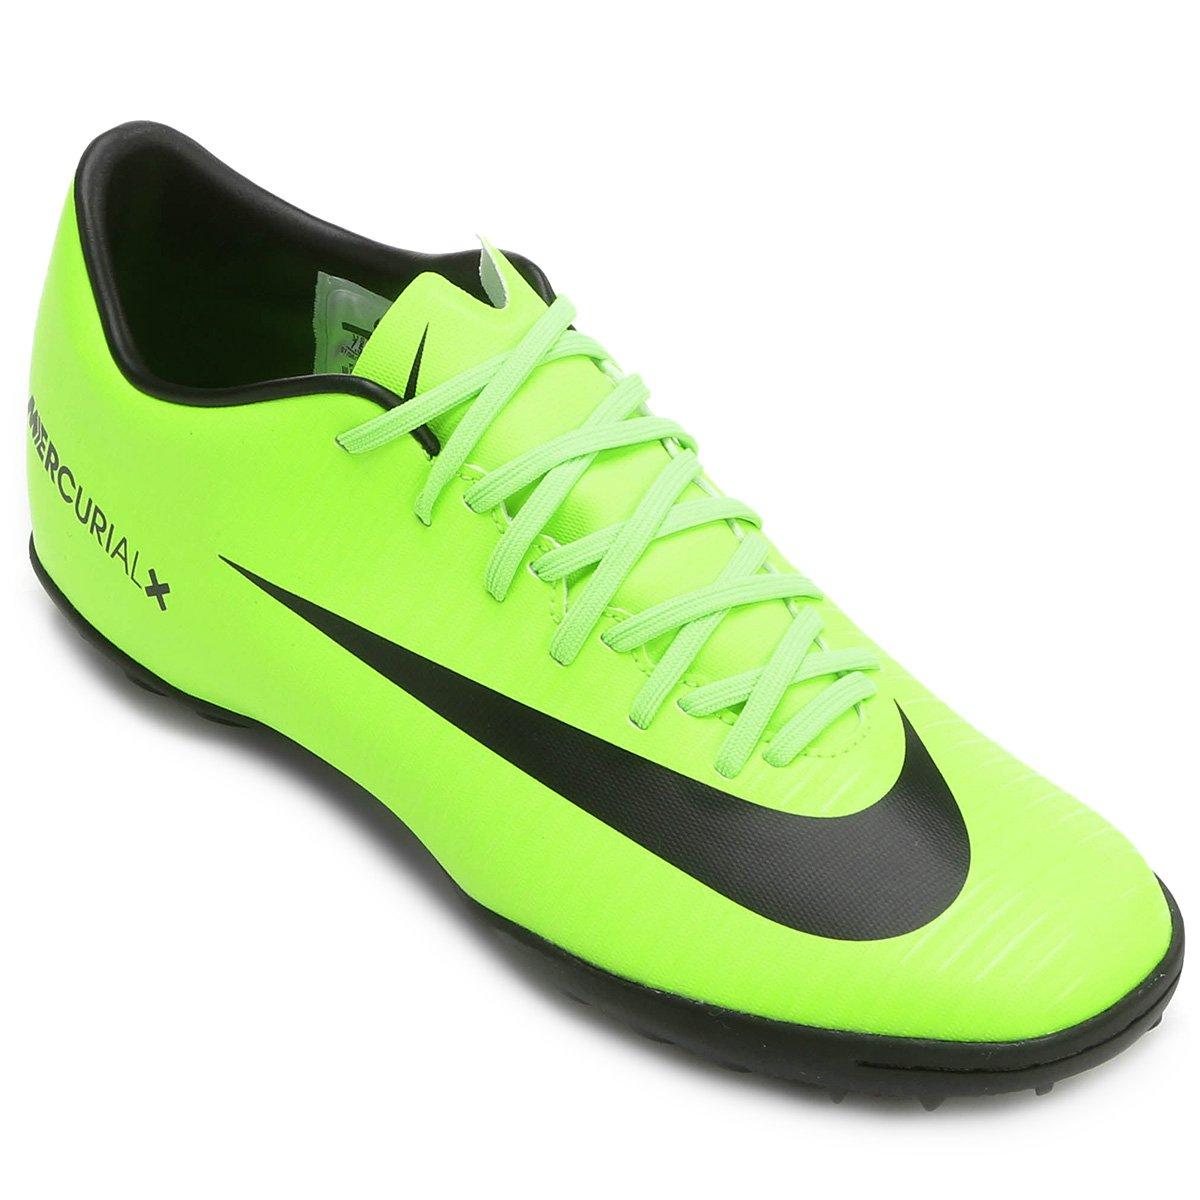 1151373f08 Chuteira Society Nike Mercurial Victory 6 TF - Compre Agora